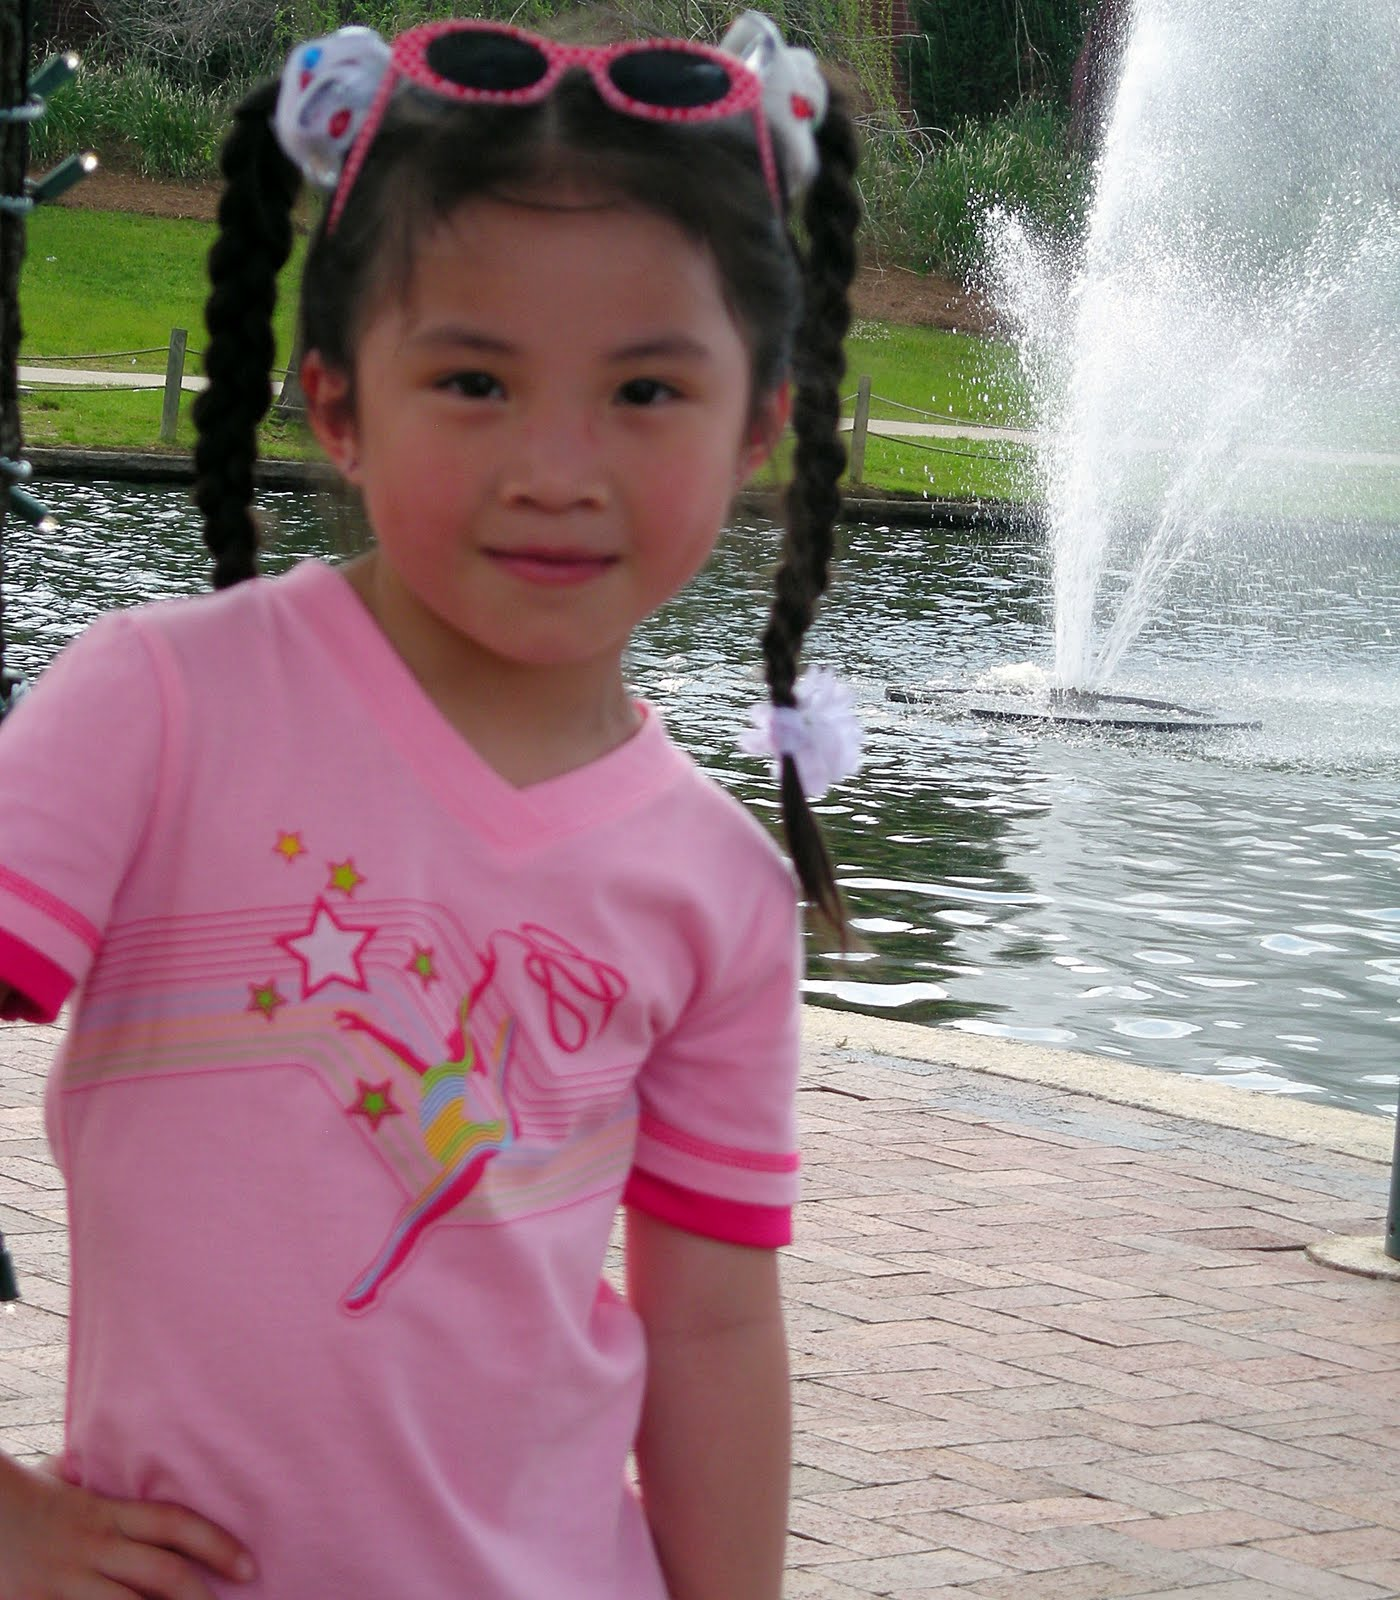 Top chelda skye model custom young girl models video description paso